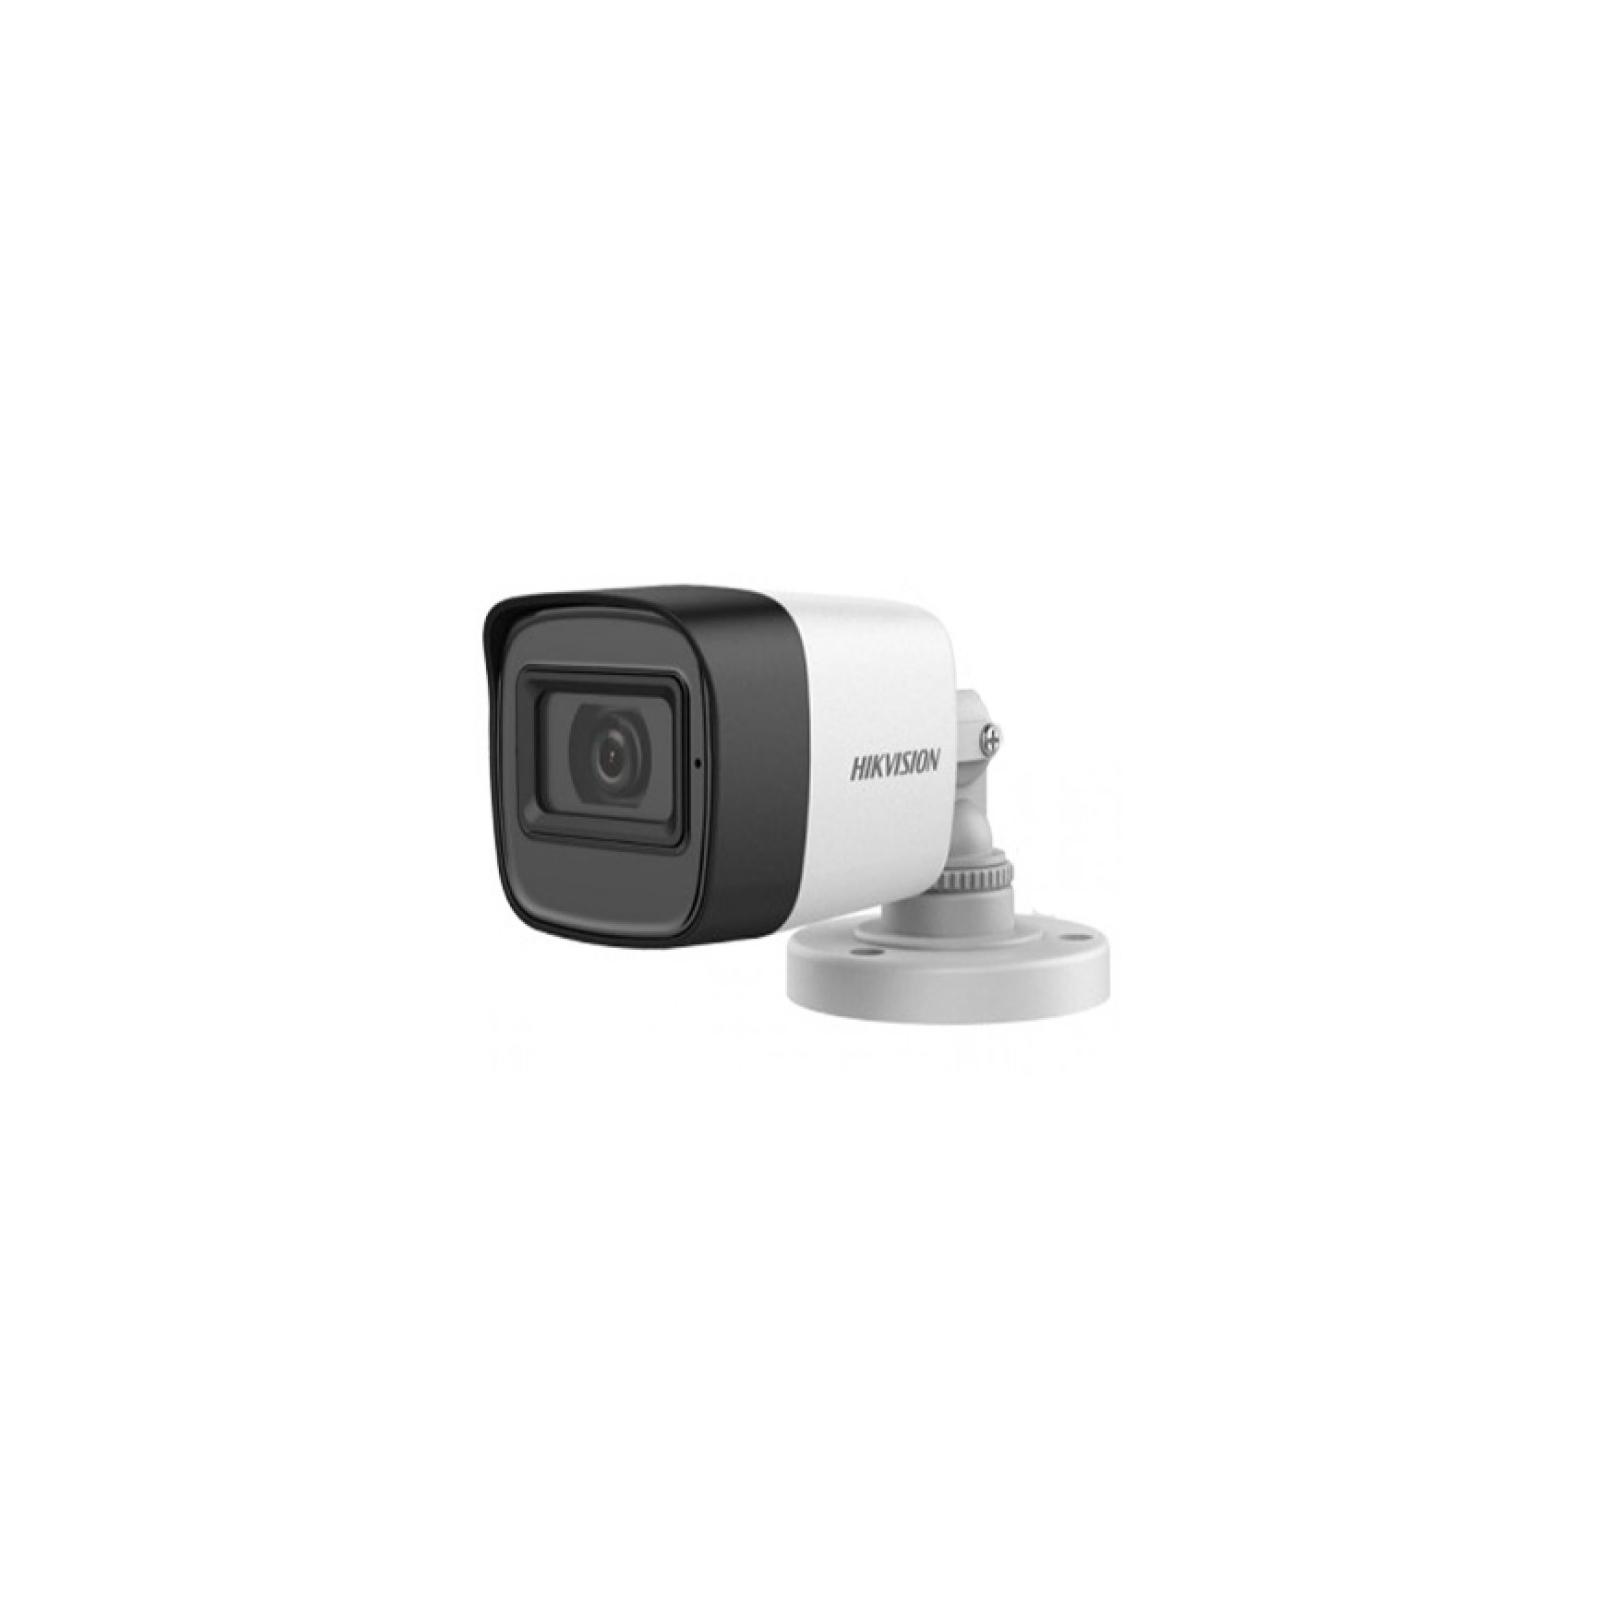 Камера видеонаблюдения Hikvision DS-2CE16H0T-ITFS (3.6)